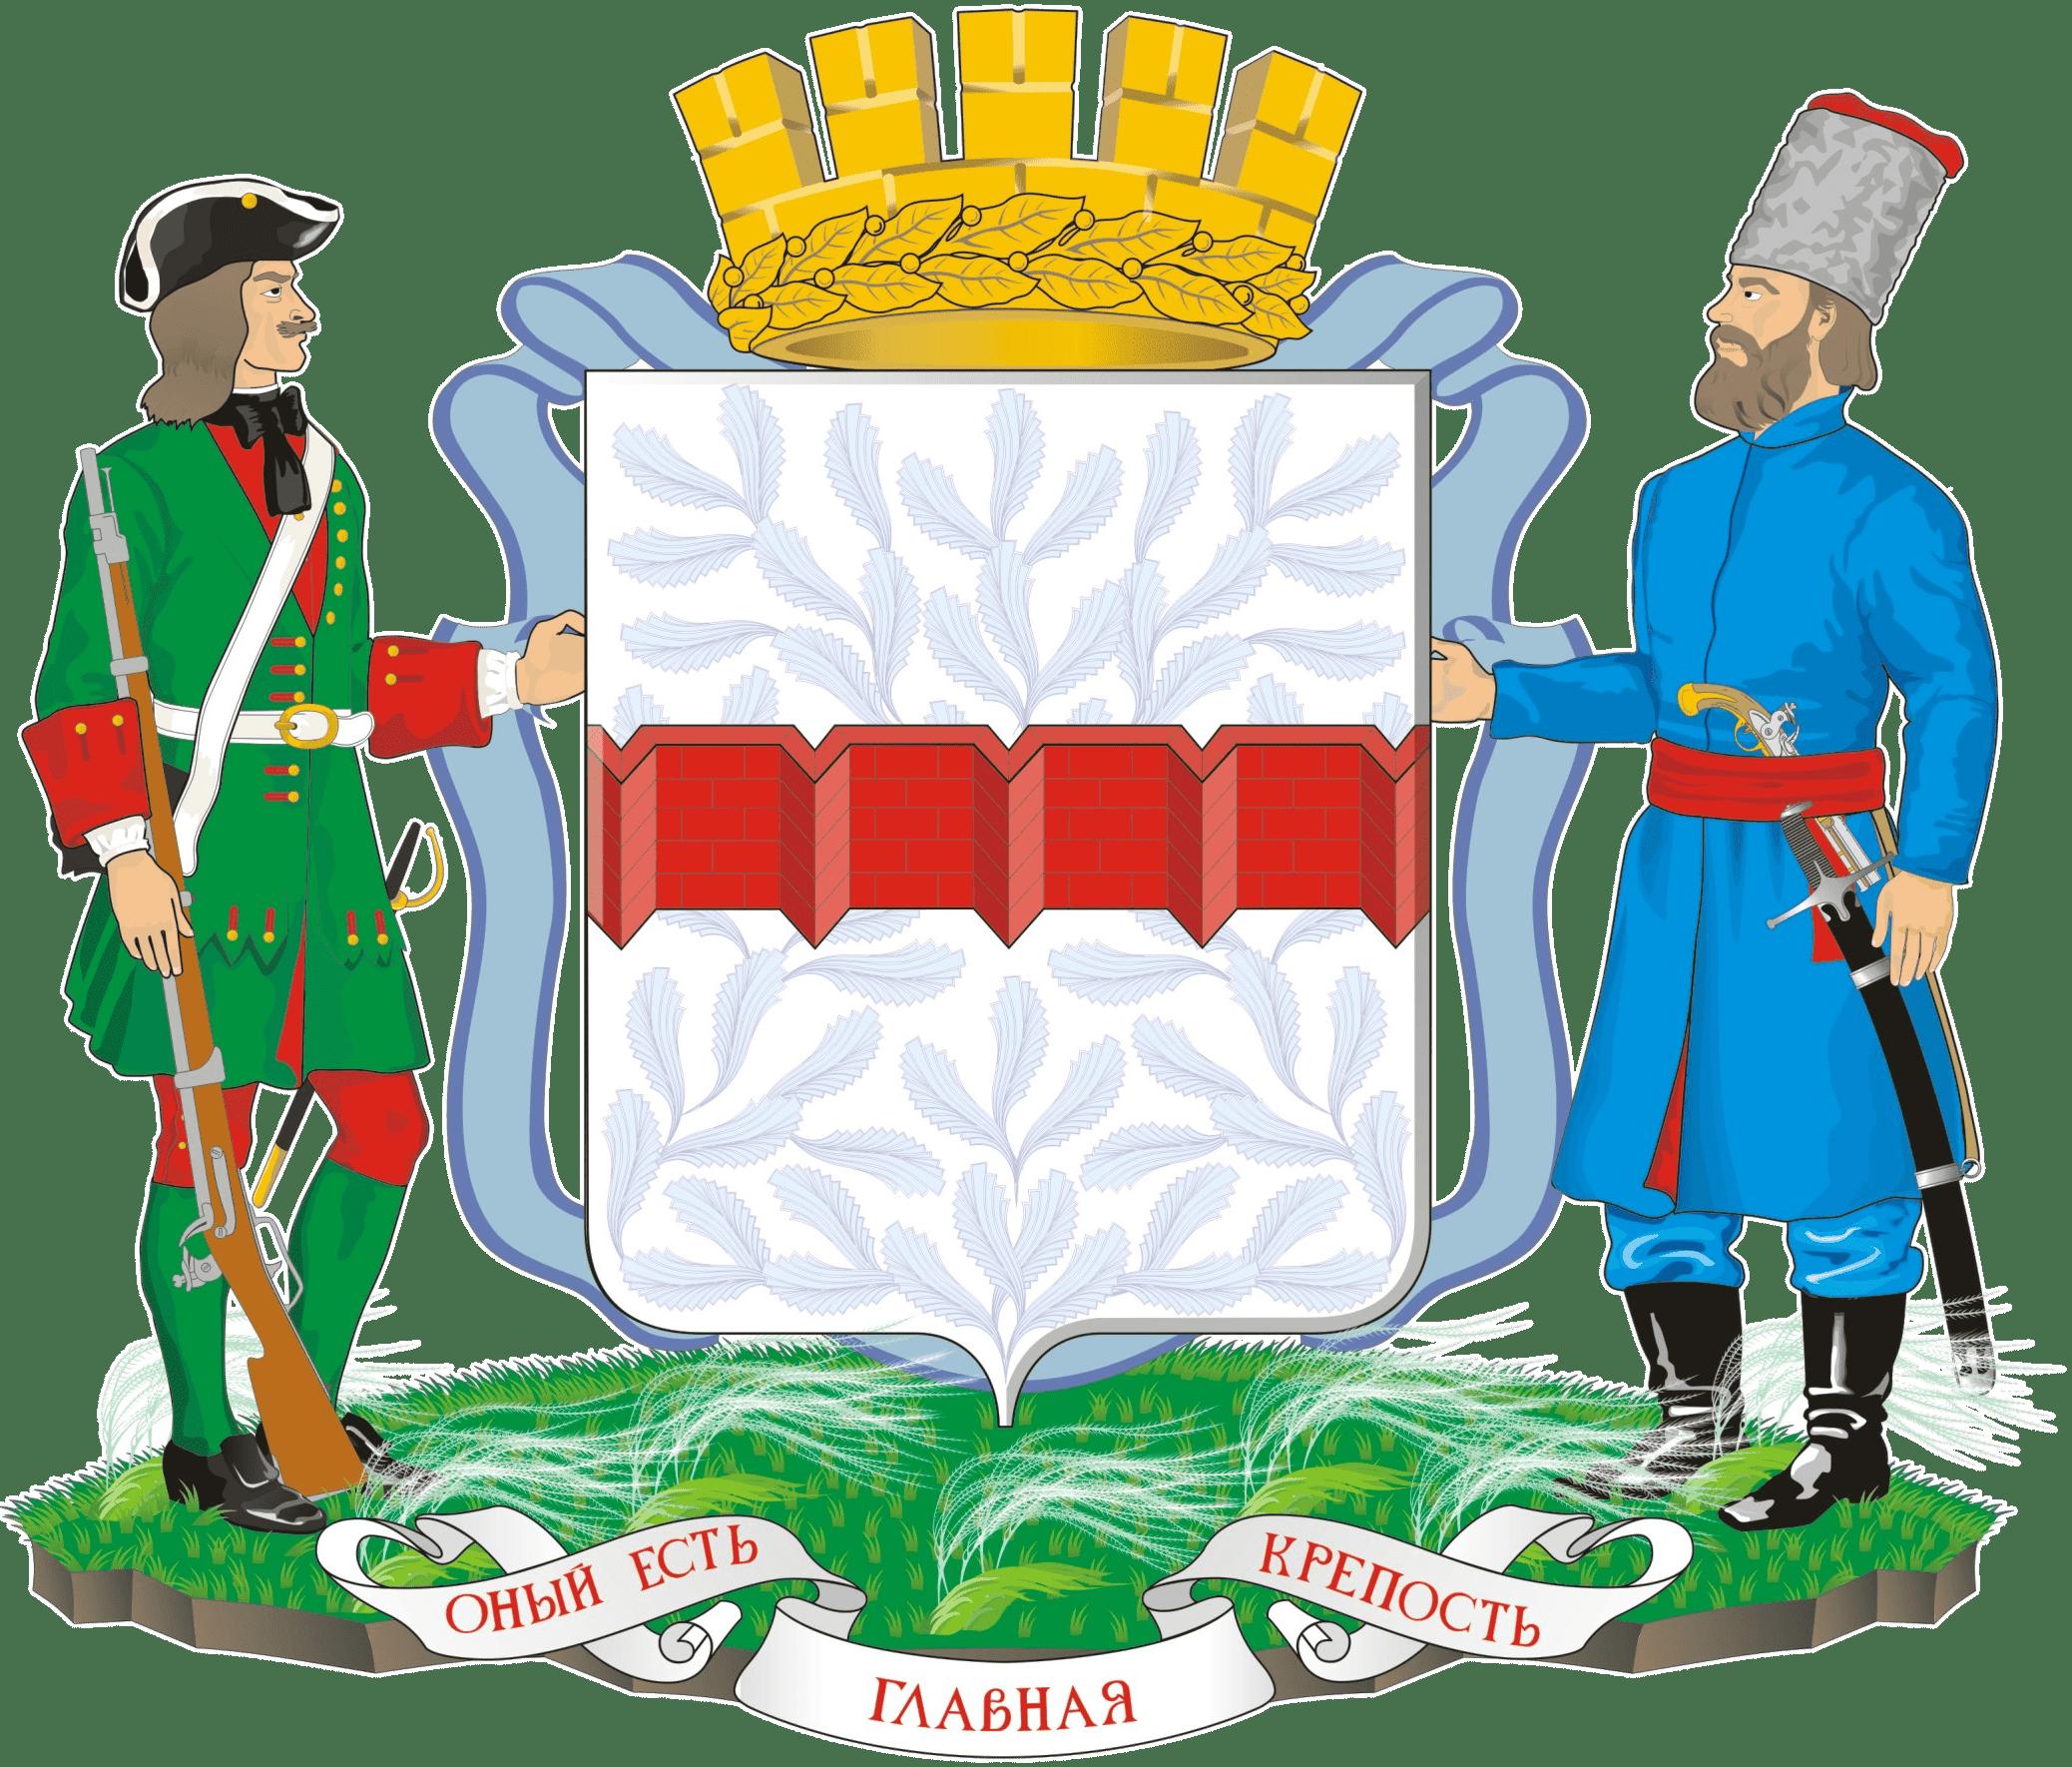 Герб города Омск